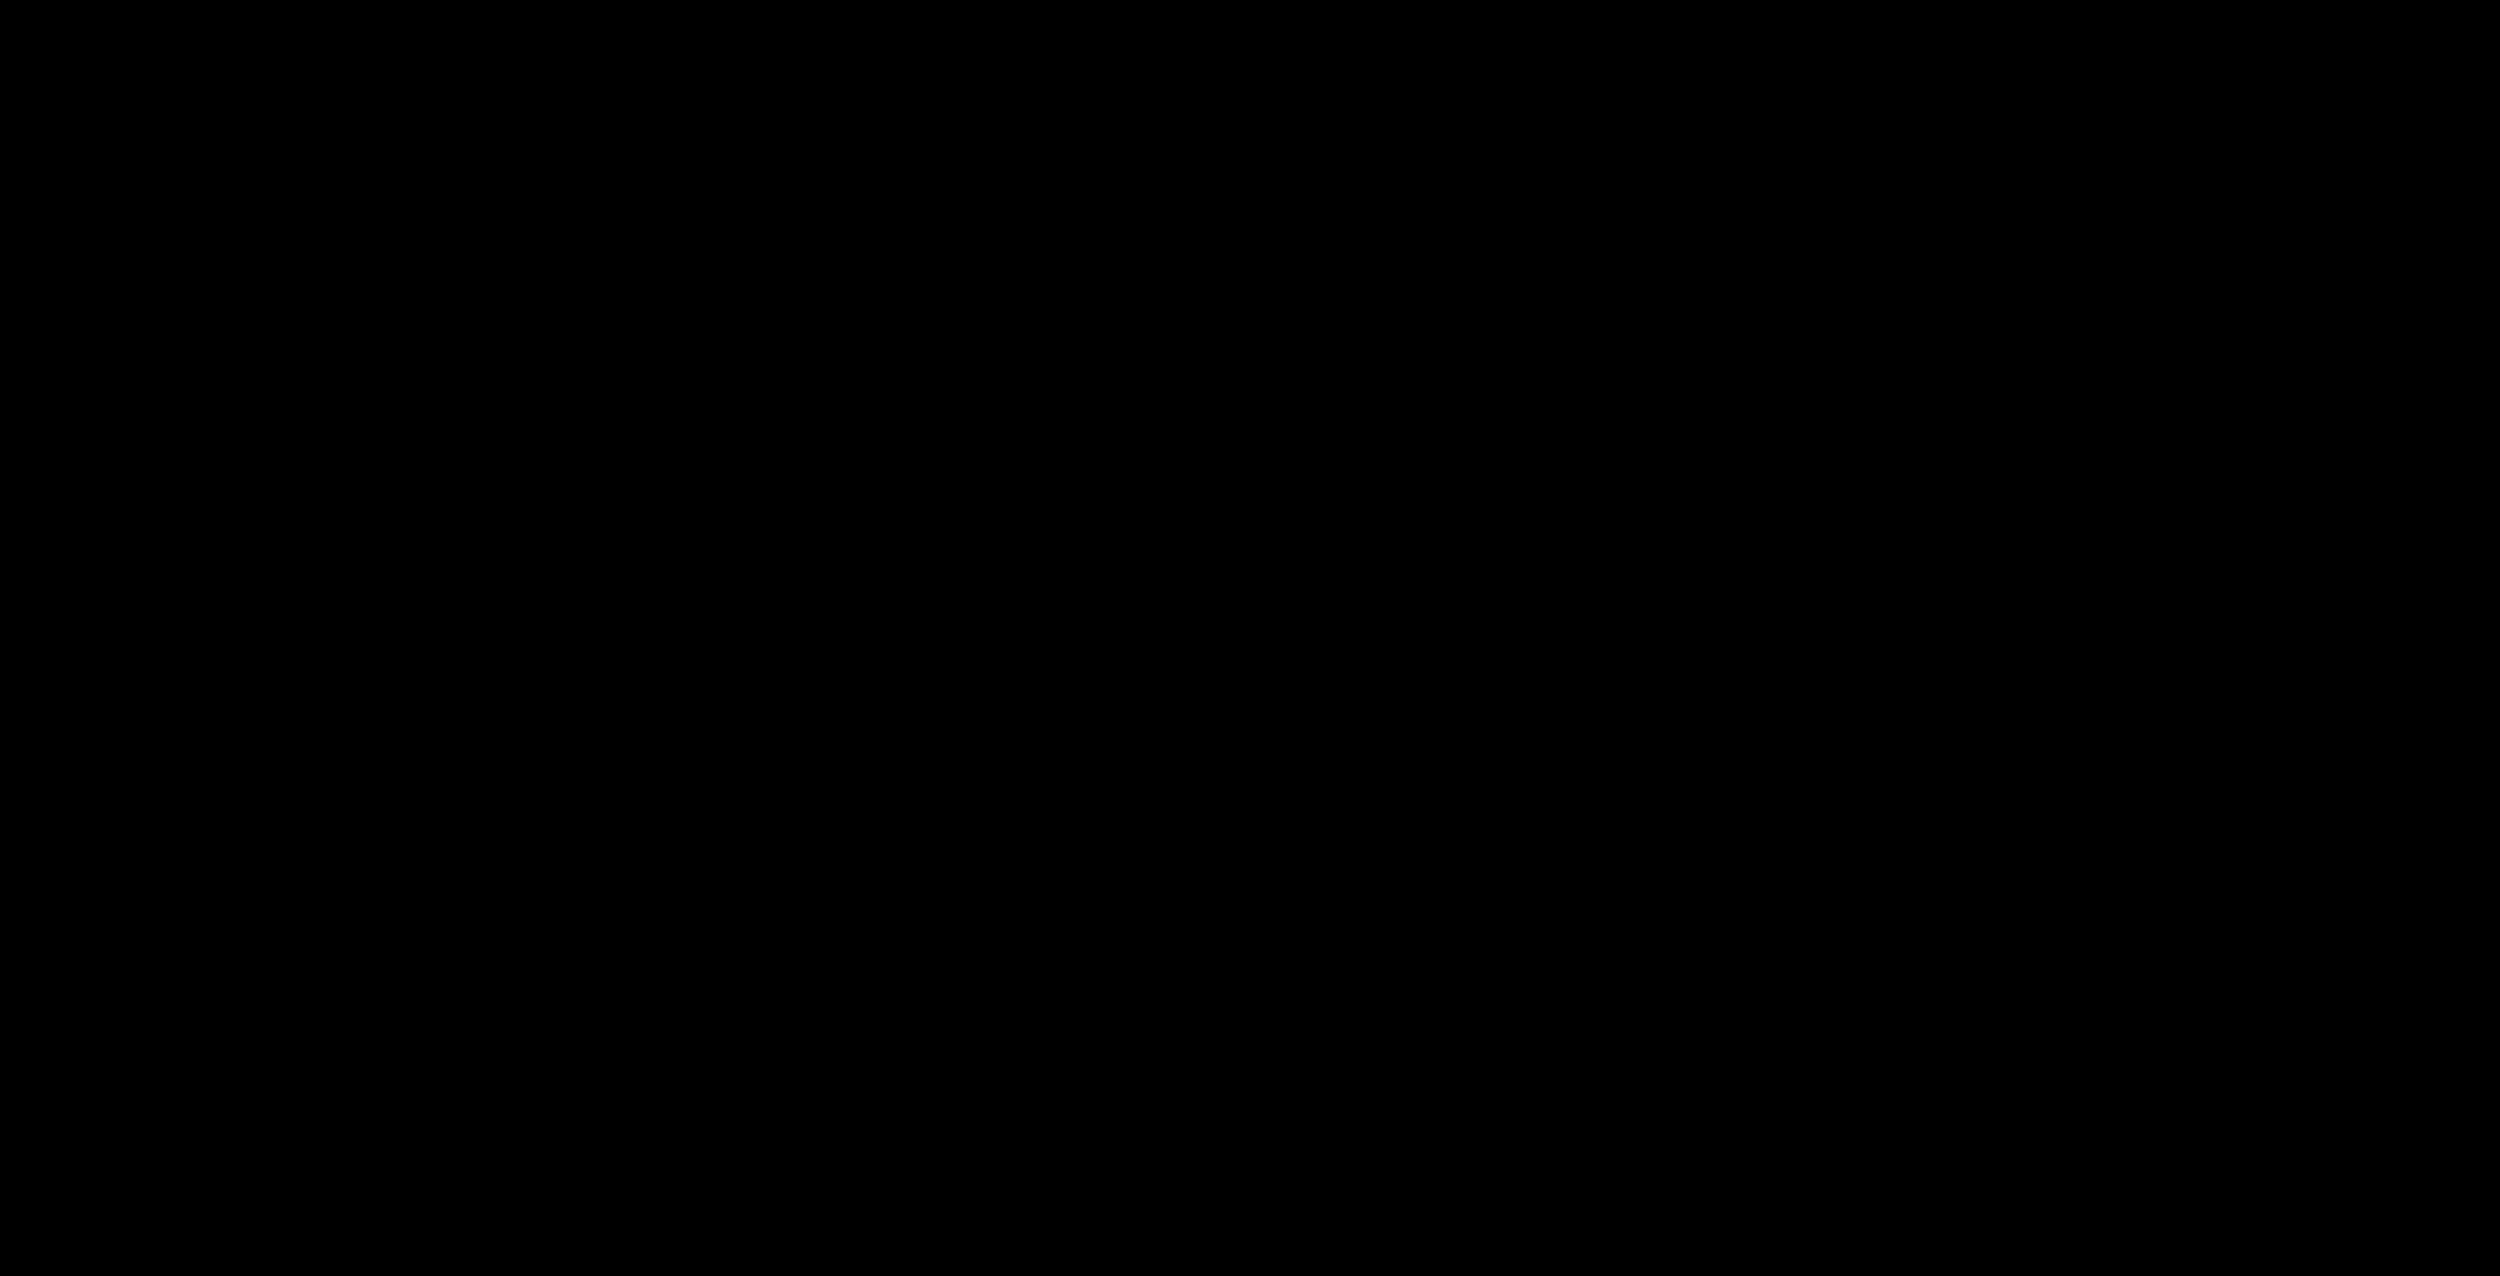 Logo_4__black_lg.png